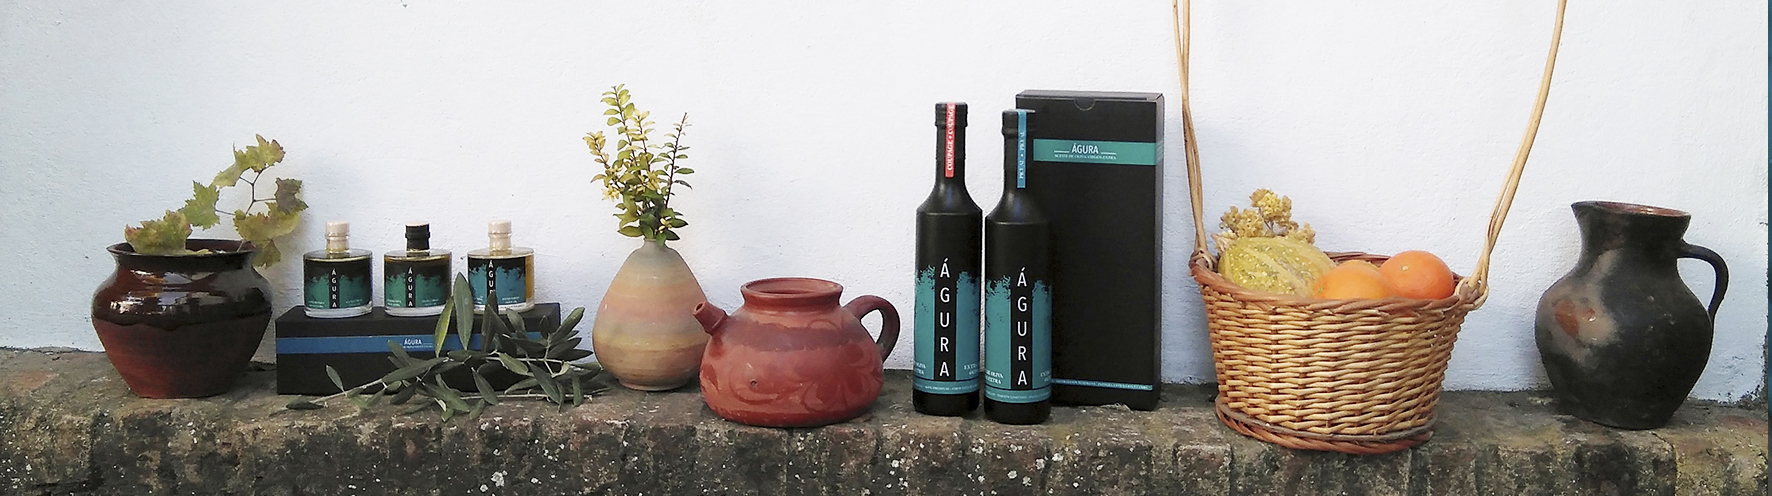 Estuches de regalo de Aceite de oliva virgen extra Premium águra